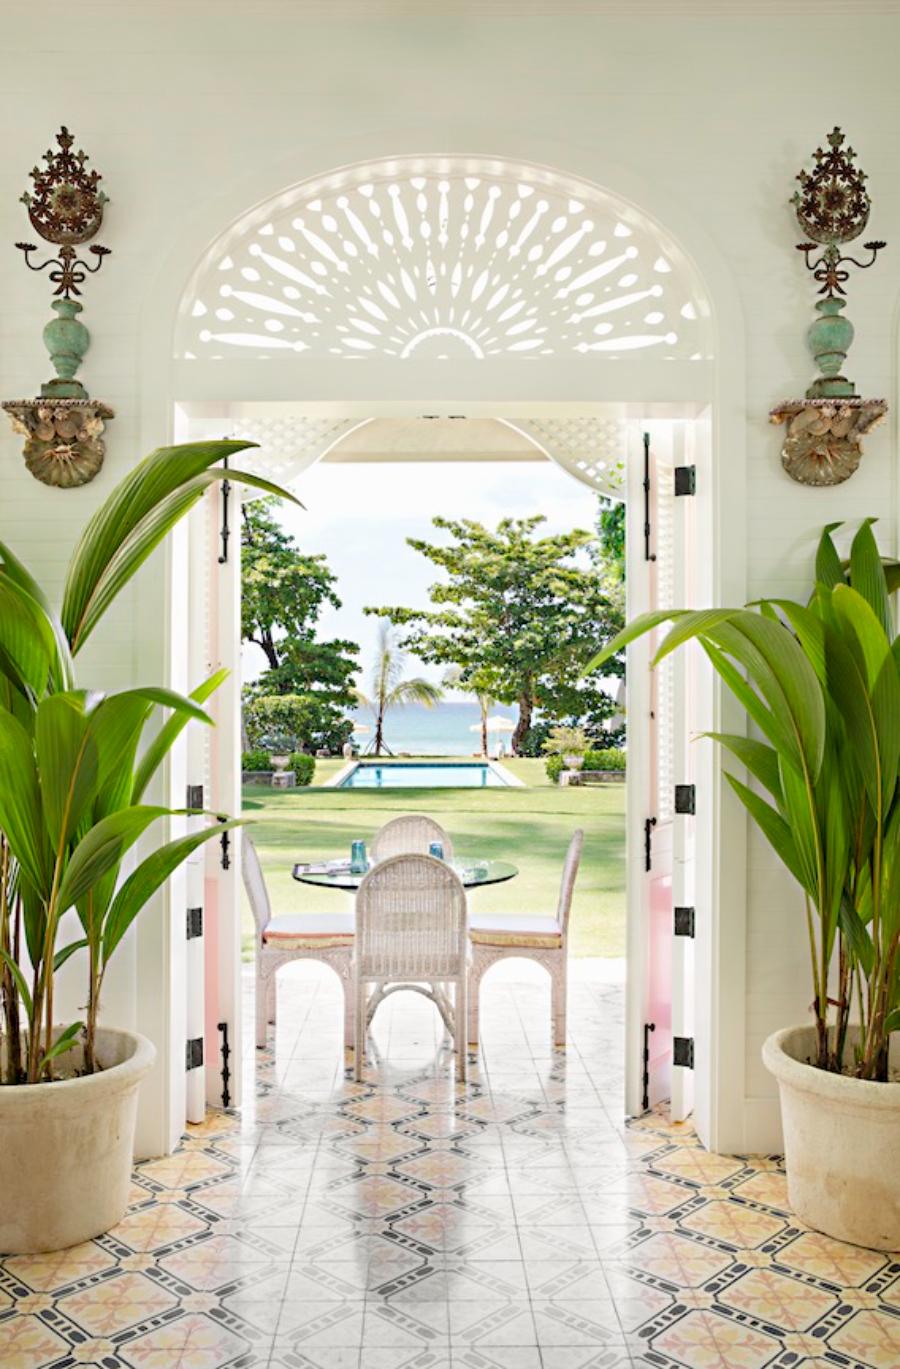 Kemble Interiors - High-End Interiors for High-End Clients kemble interiors Kemble Interiors – High-End Interiors for High-End Clients Kimble Interiors High End Interiors for High End Clients Playa Grande